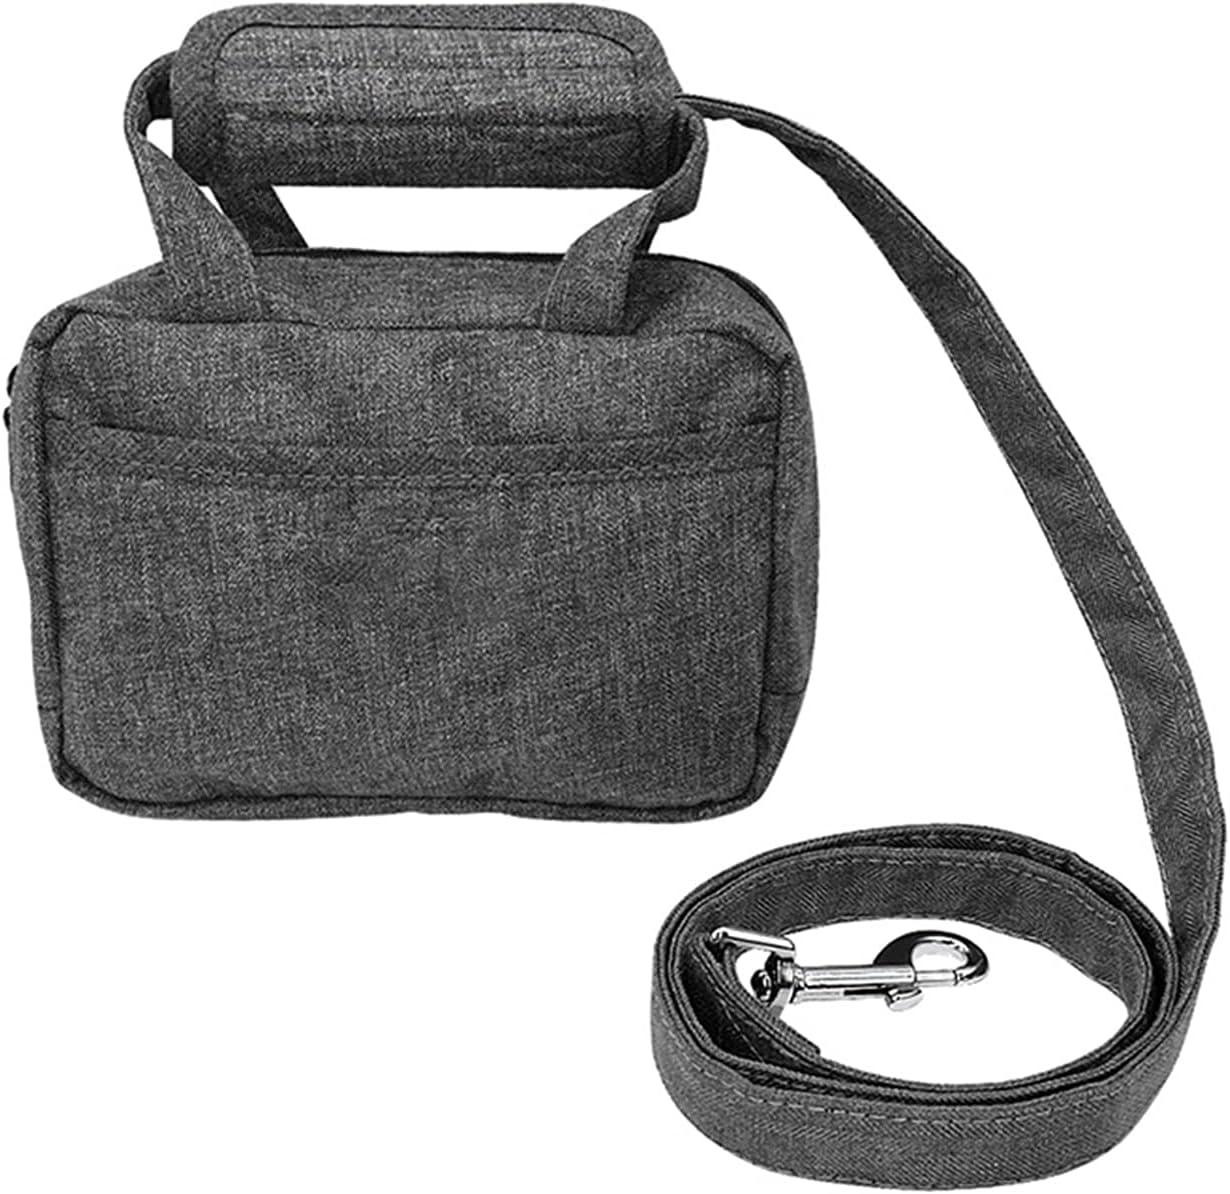 SRAMO Max 71% OFF Dog Leash Bag Pet Training Cheap SALE Start Walking Treat Poop Pouch